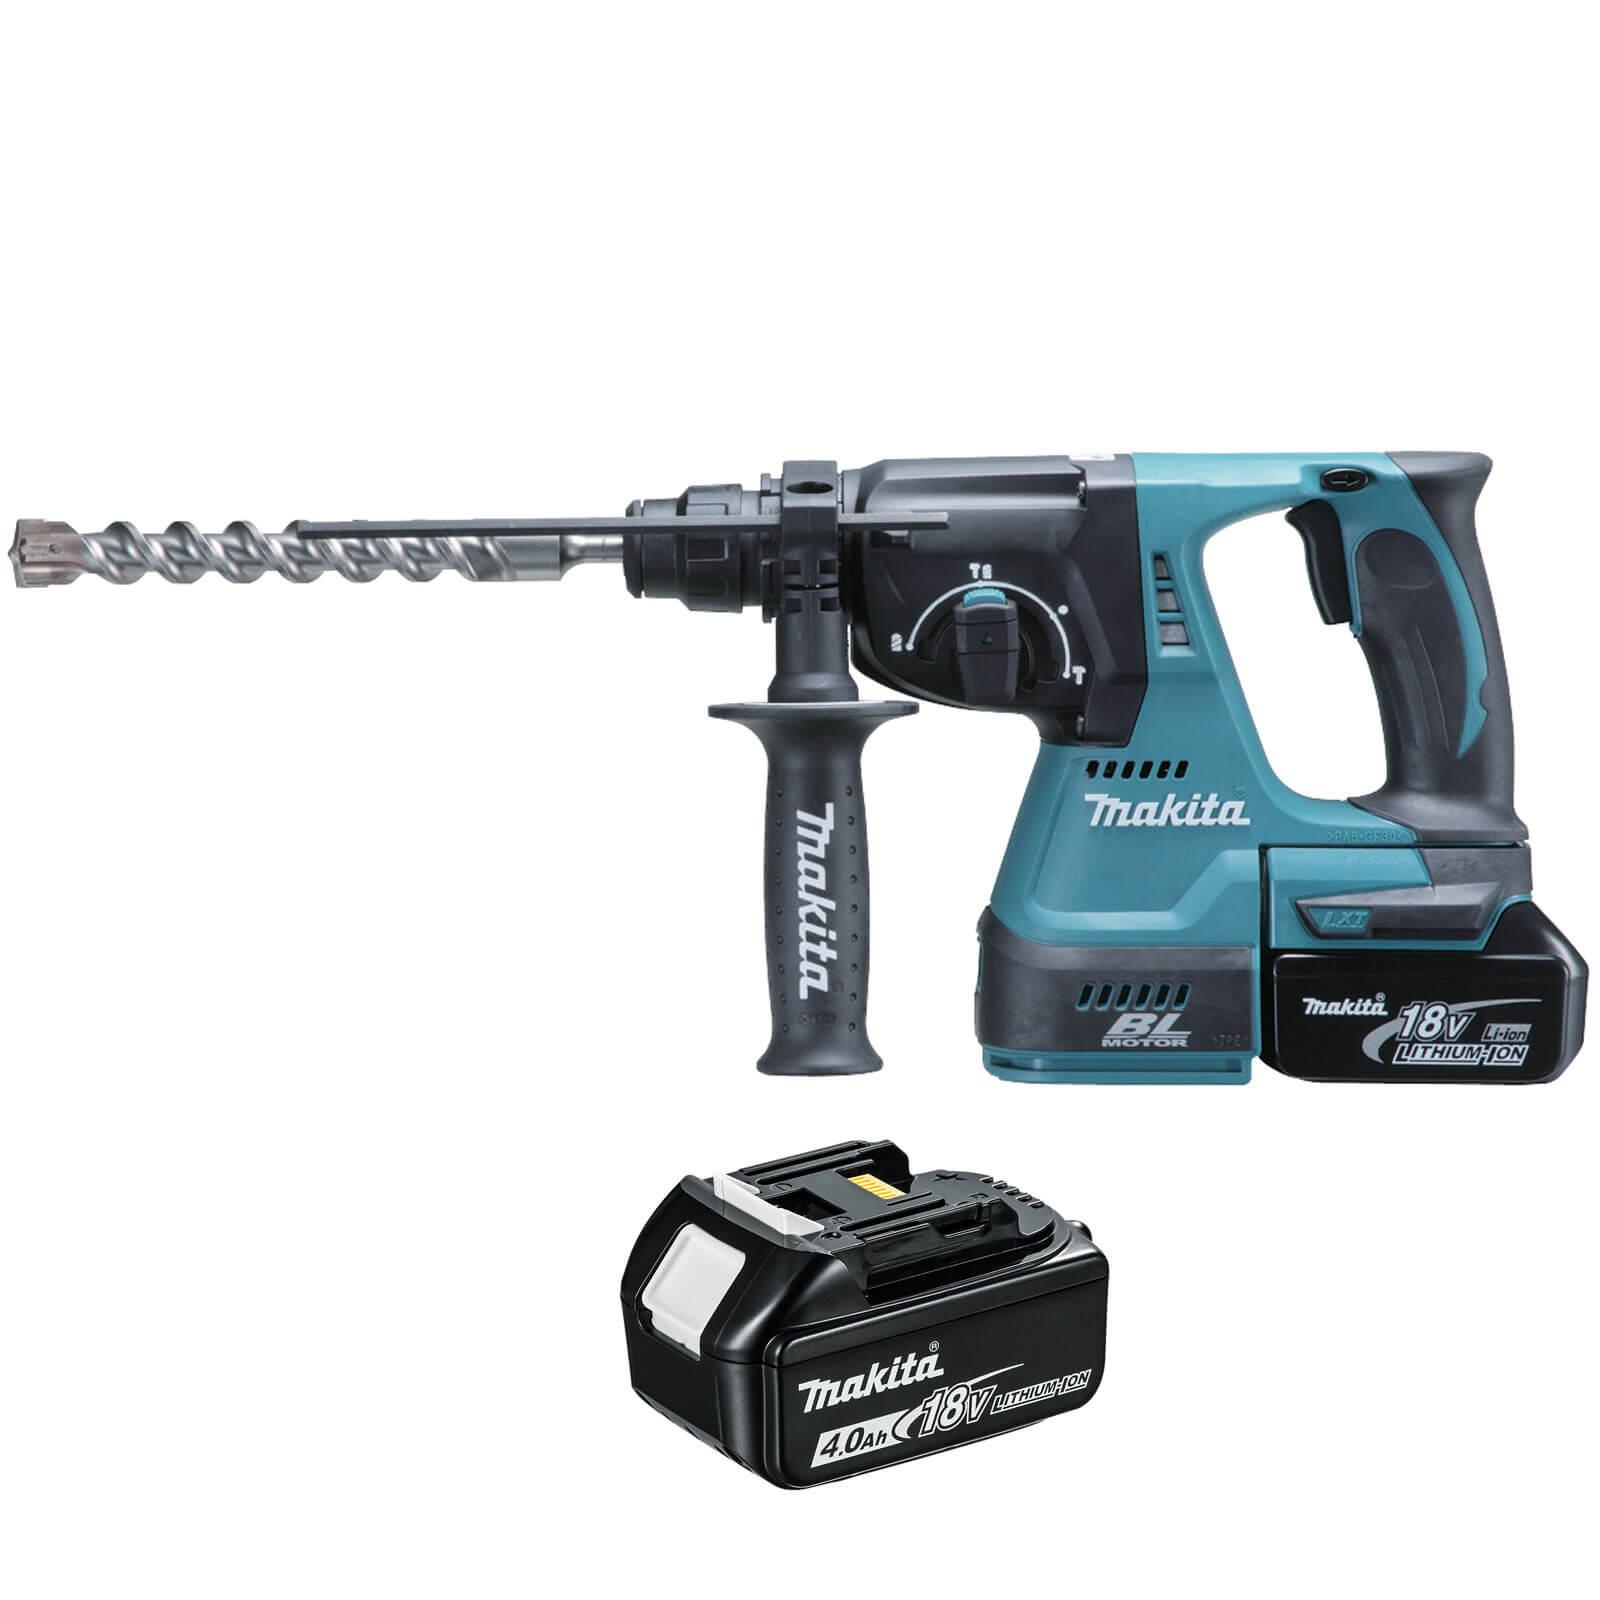 makita dhr243 18v cordless lxt brushless sds hammer drill 2 x 4ah li ion charger case. Black Bedroom Furniture Sets. Home Design Ideas